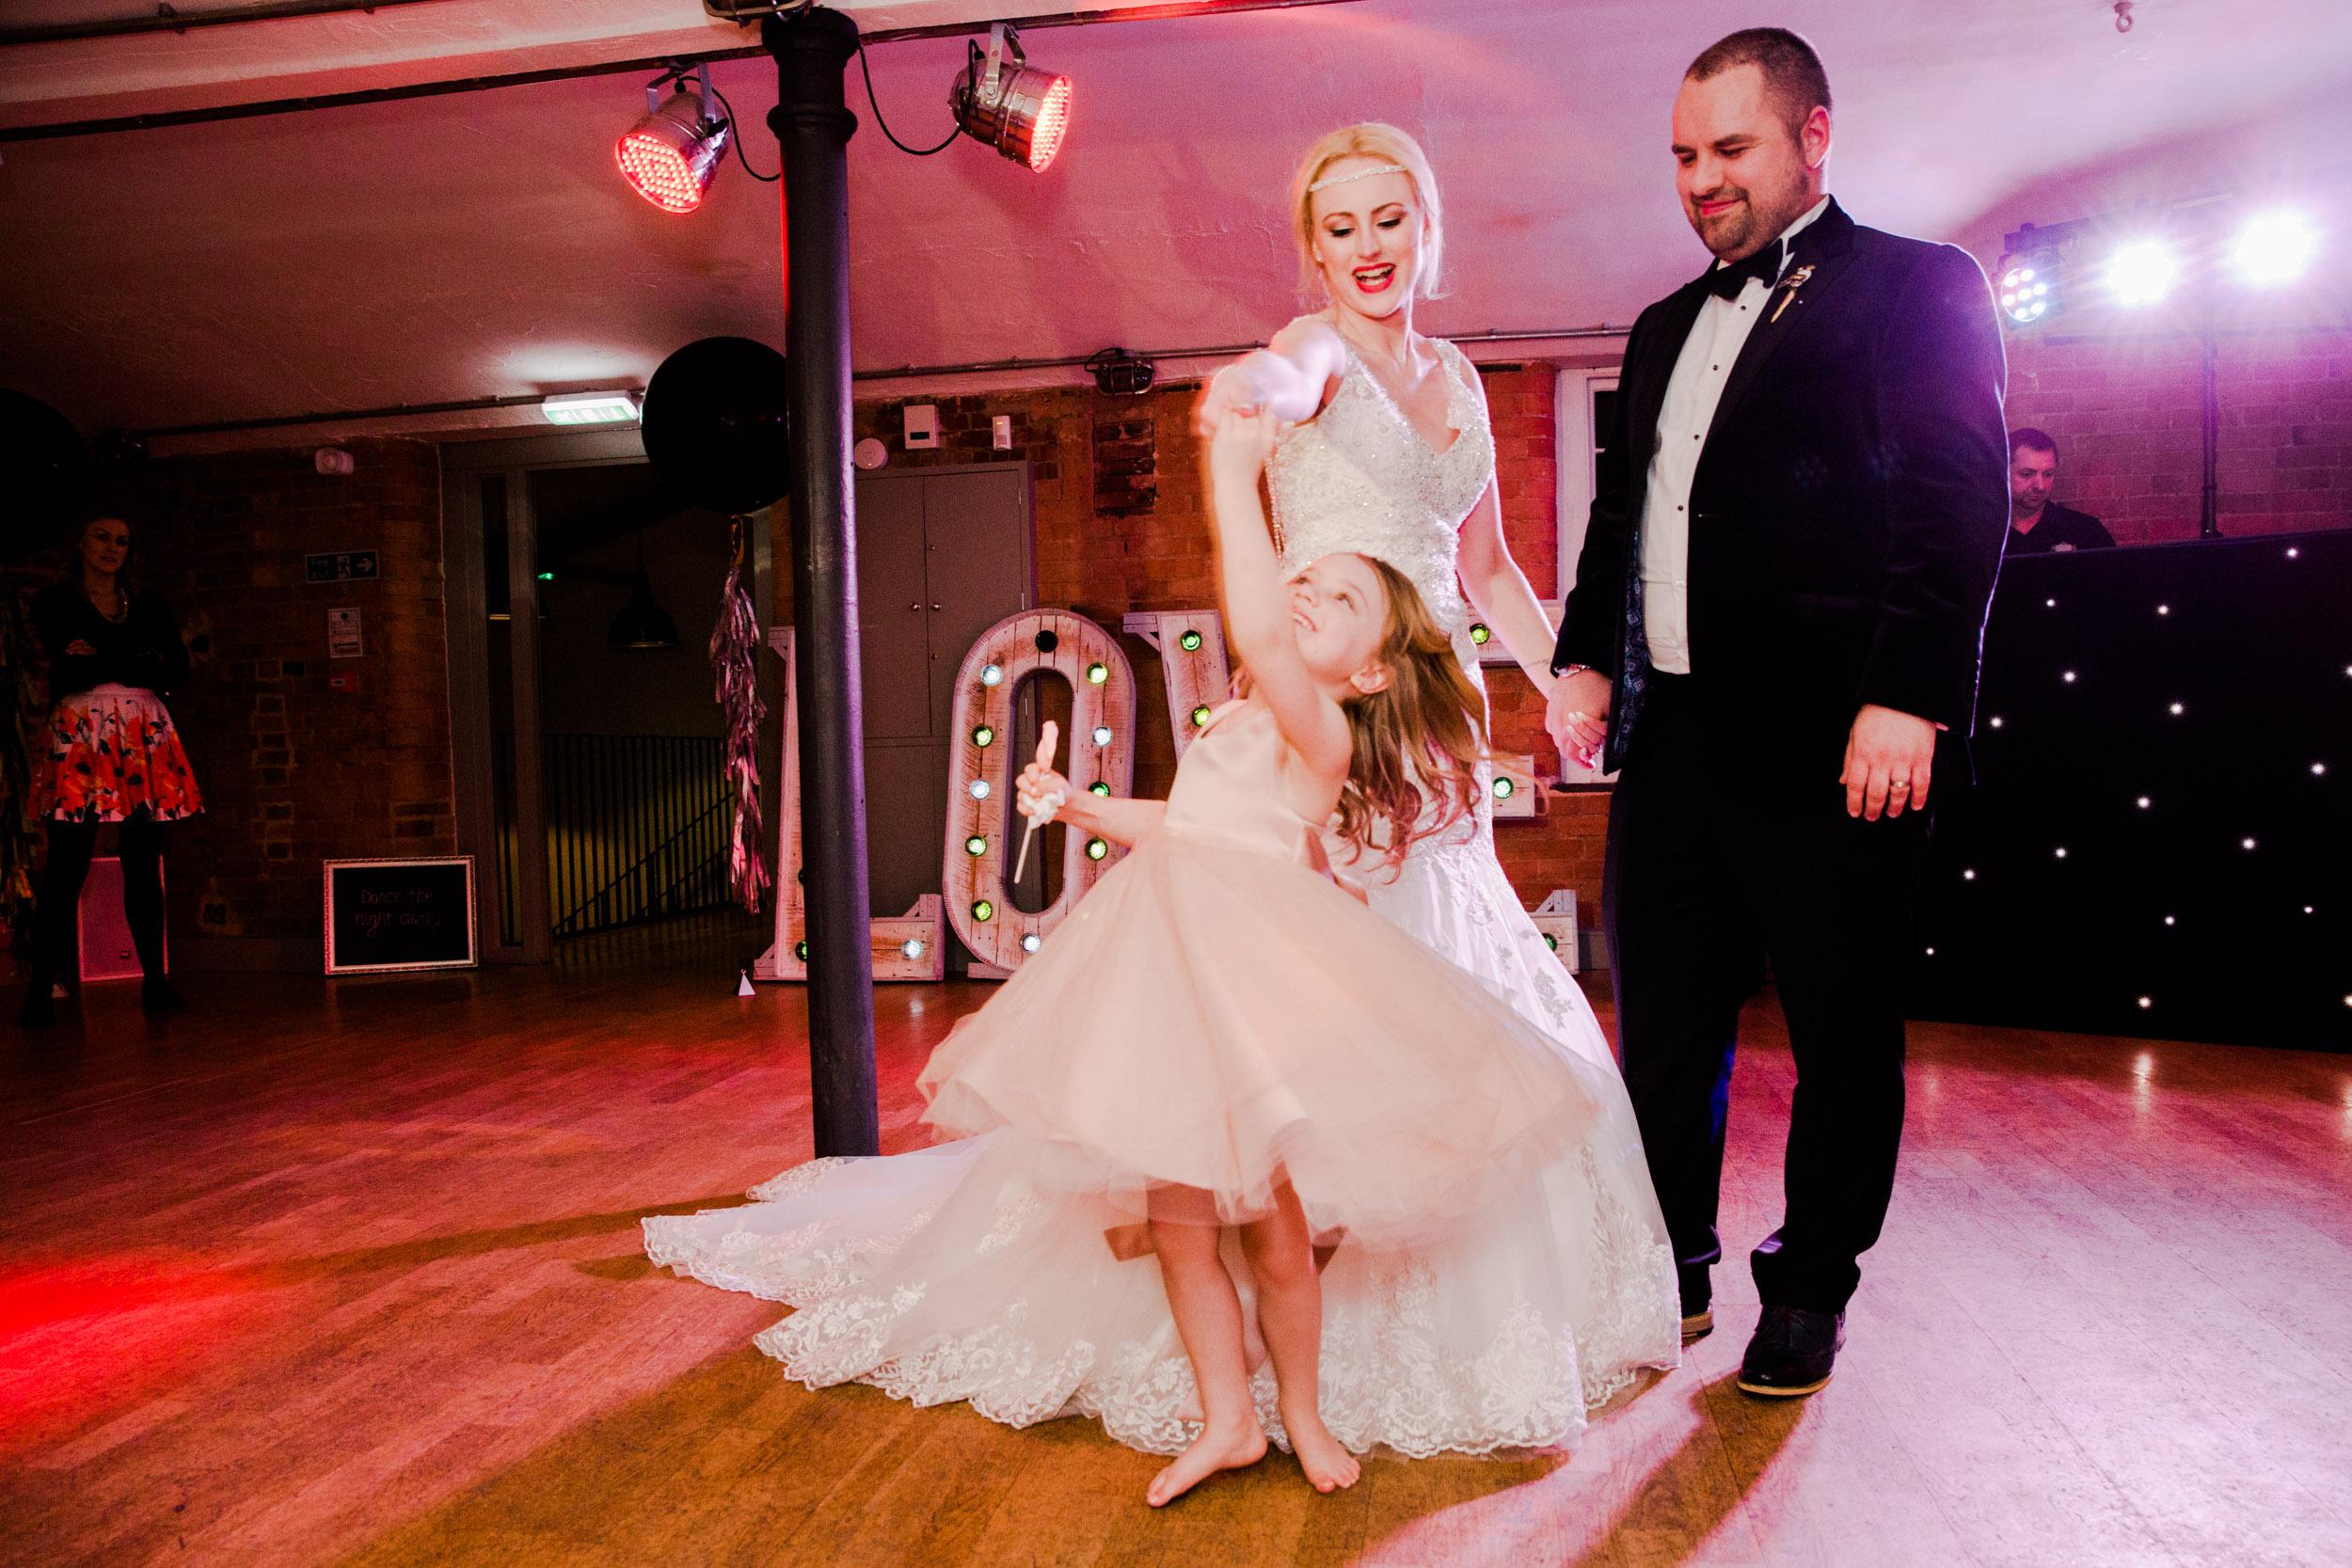 Industrial_glamour_wedding_west_mill_derby185